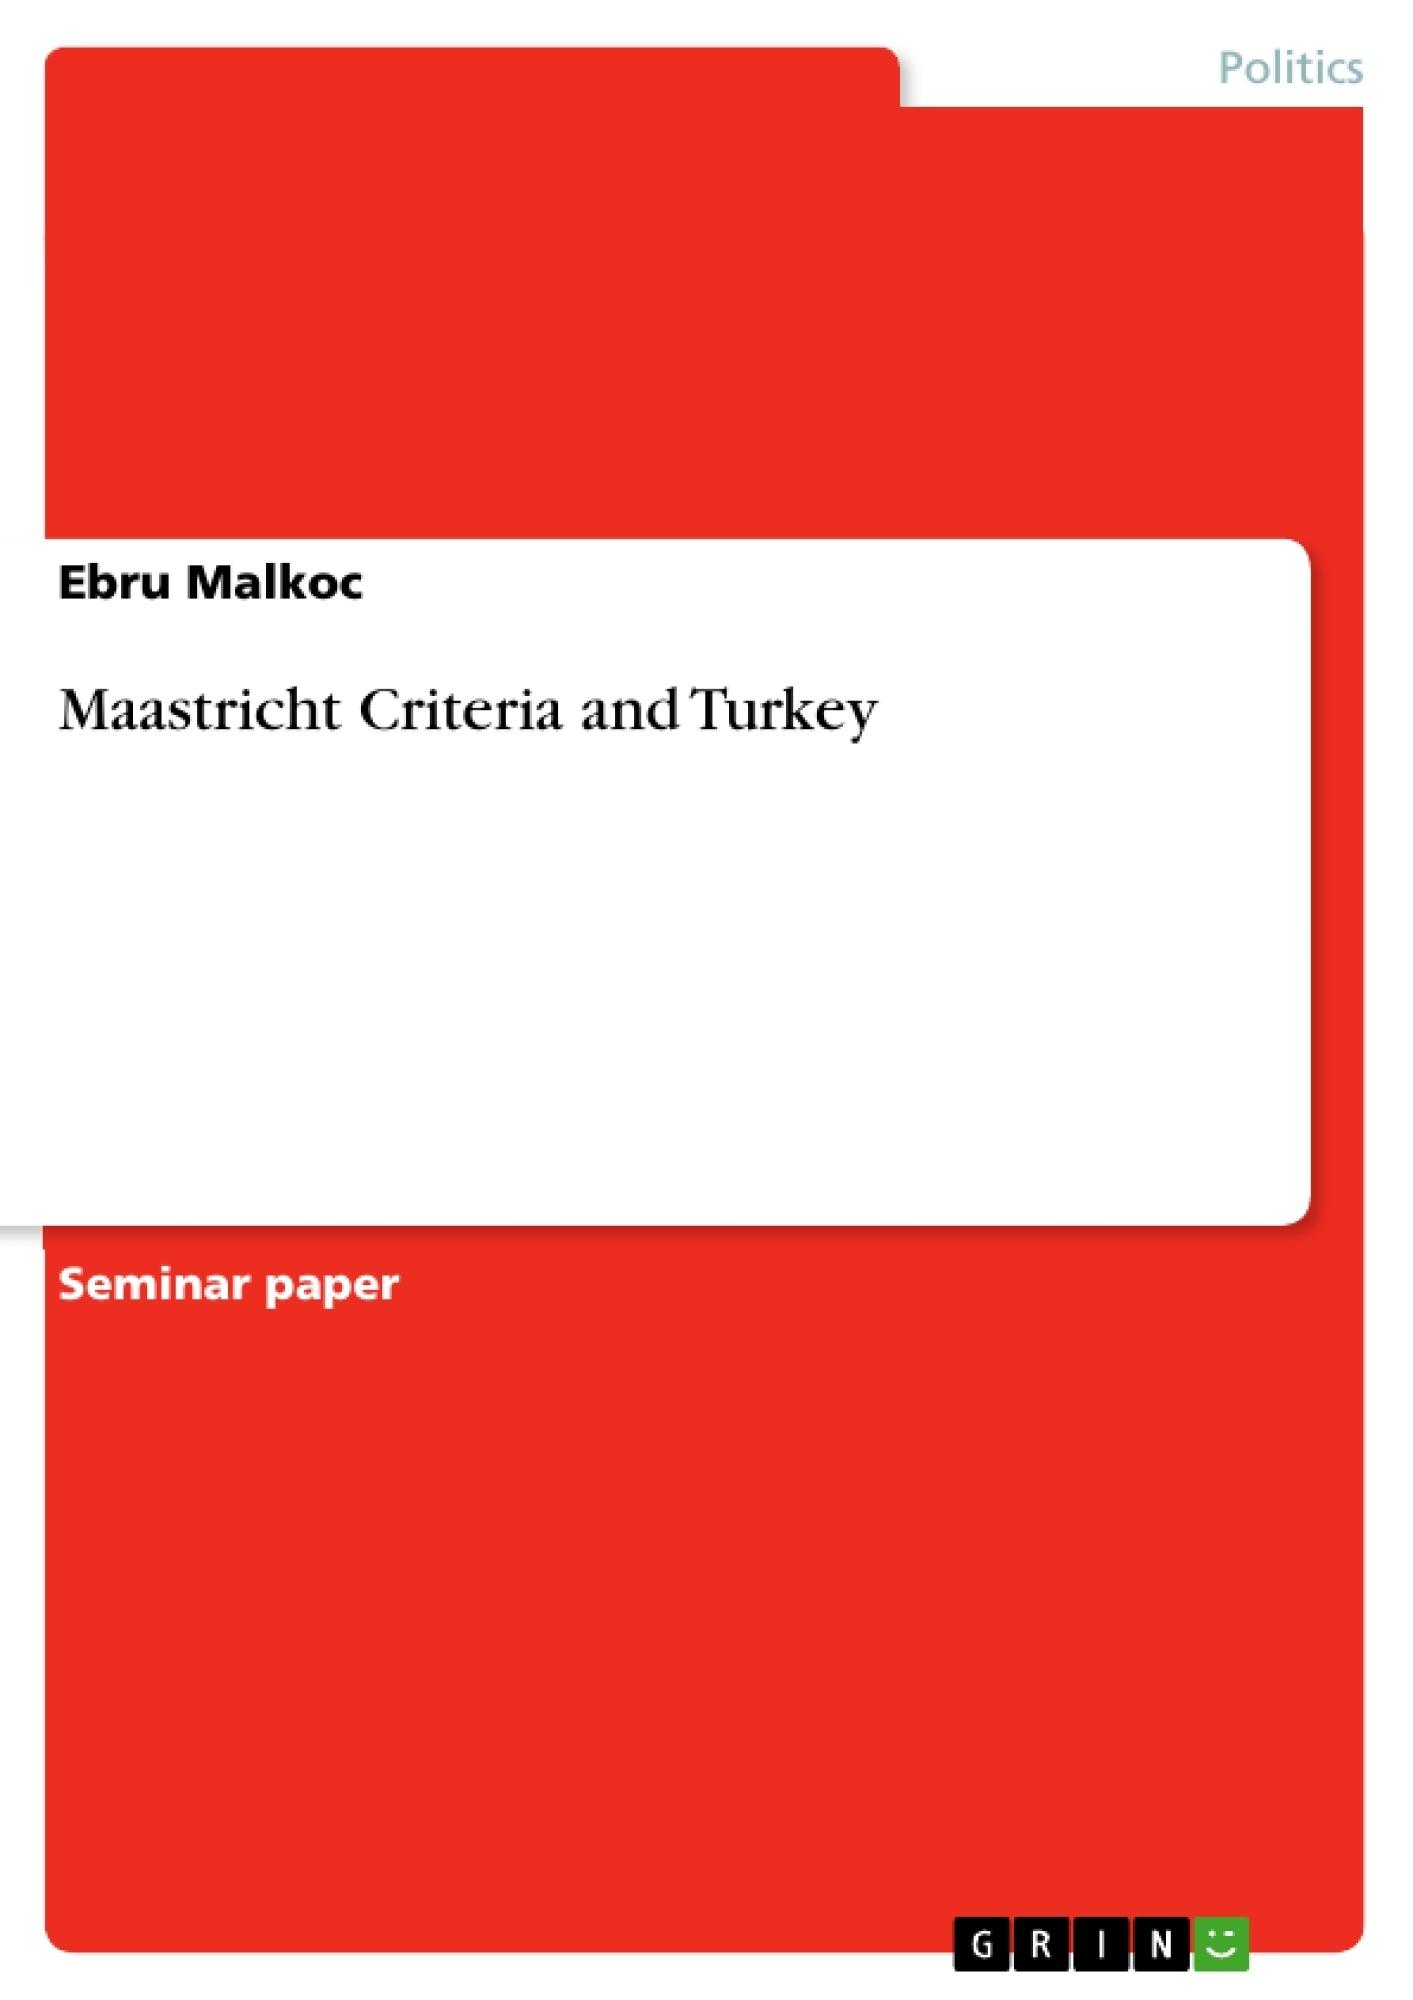 Title: Maastricht Criteria and Turkey